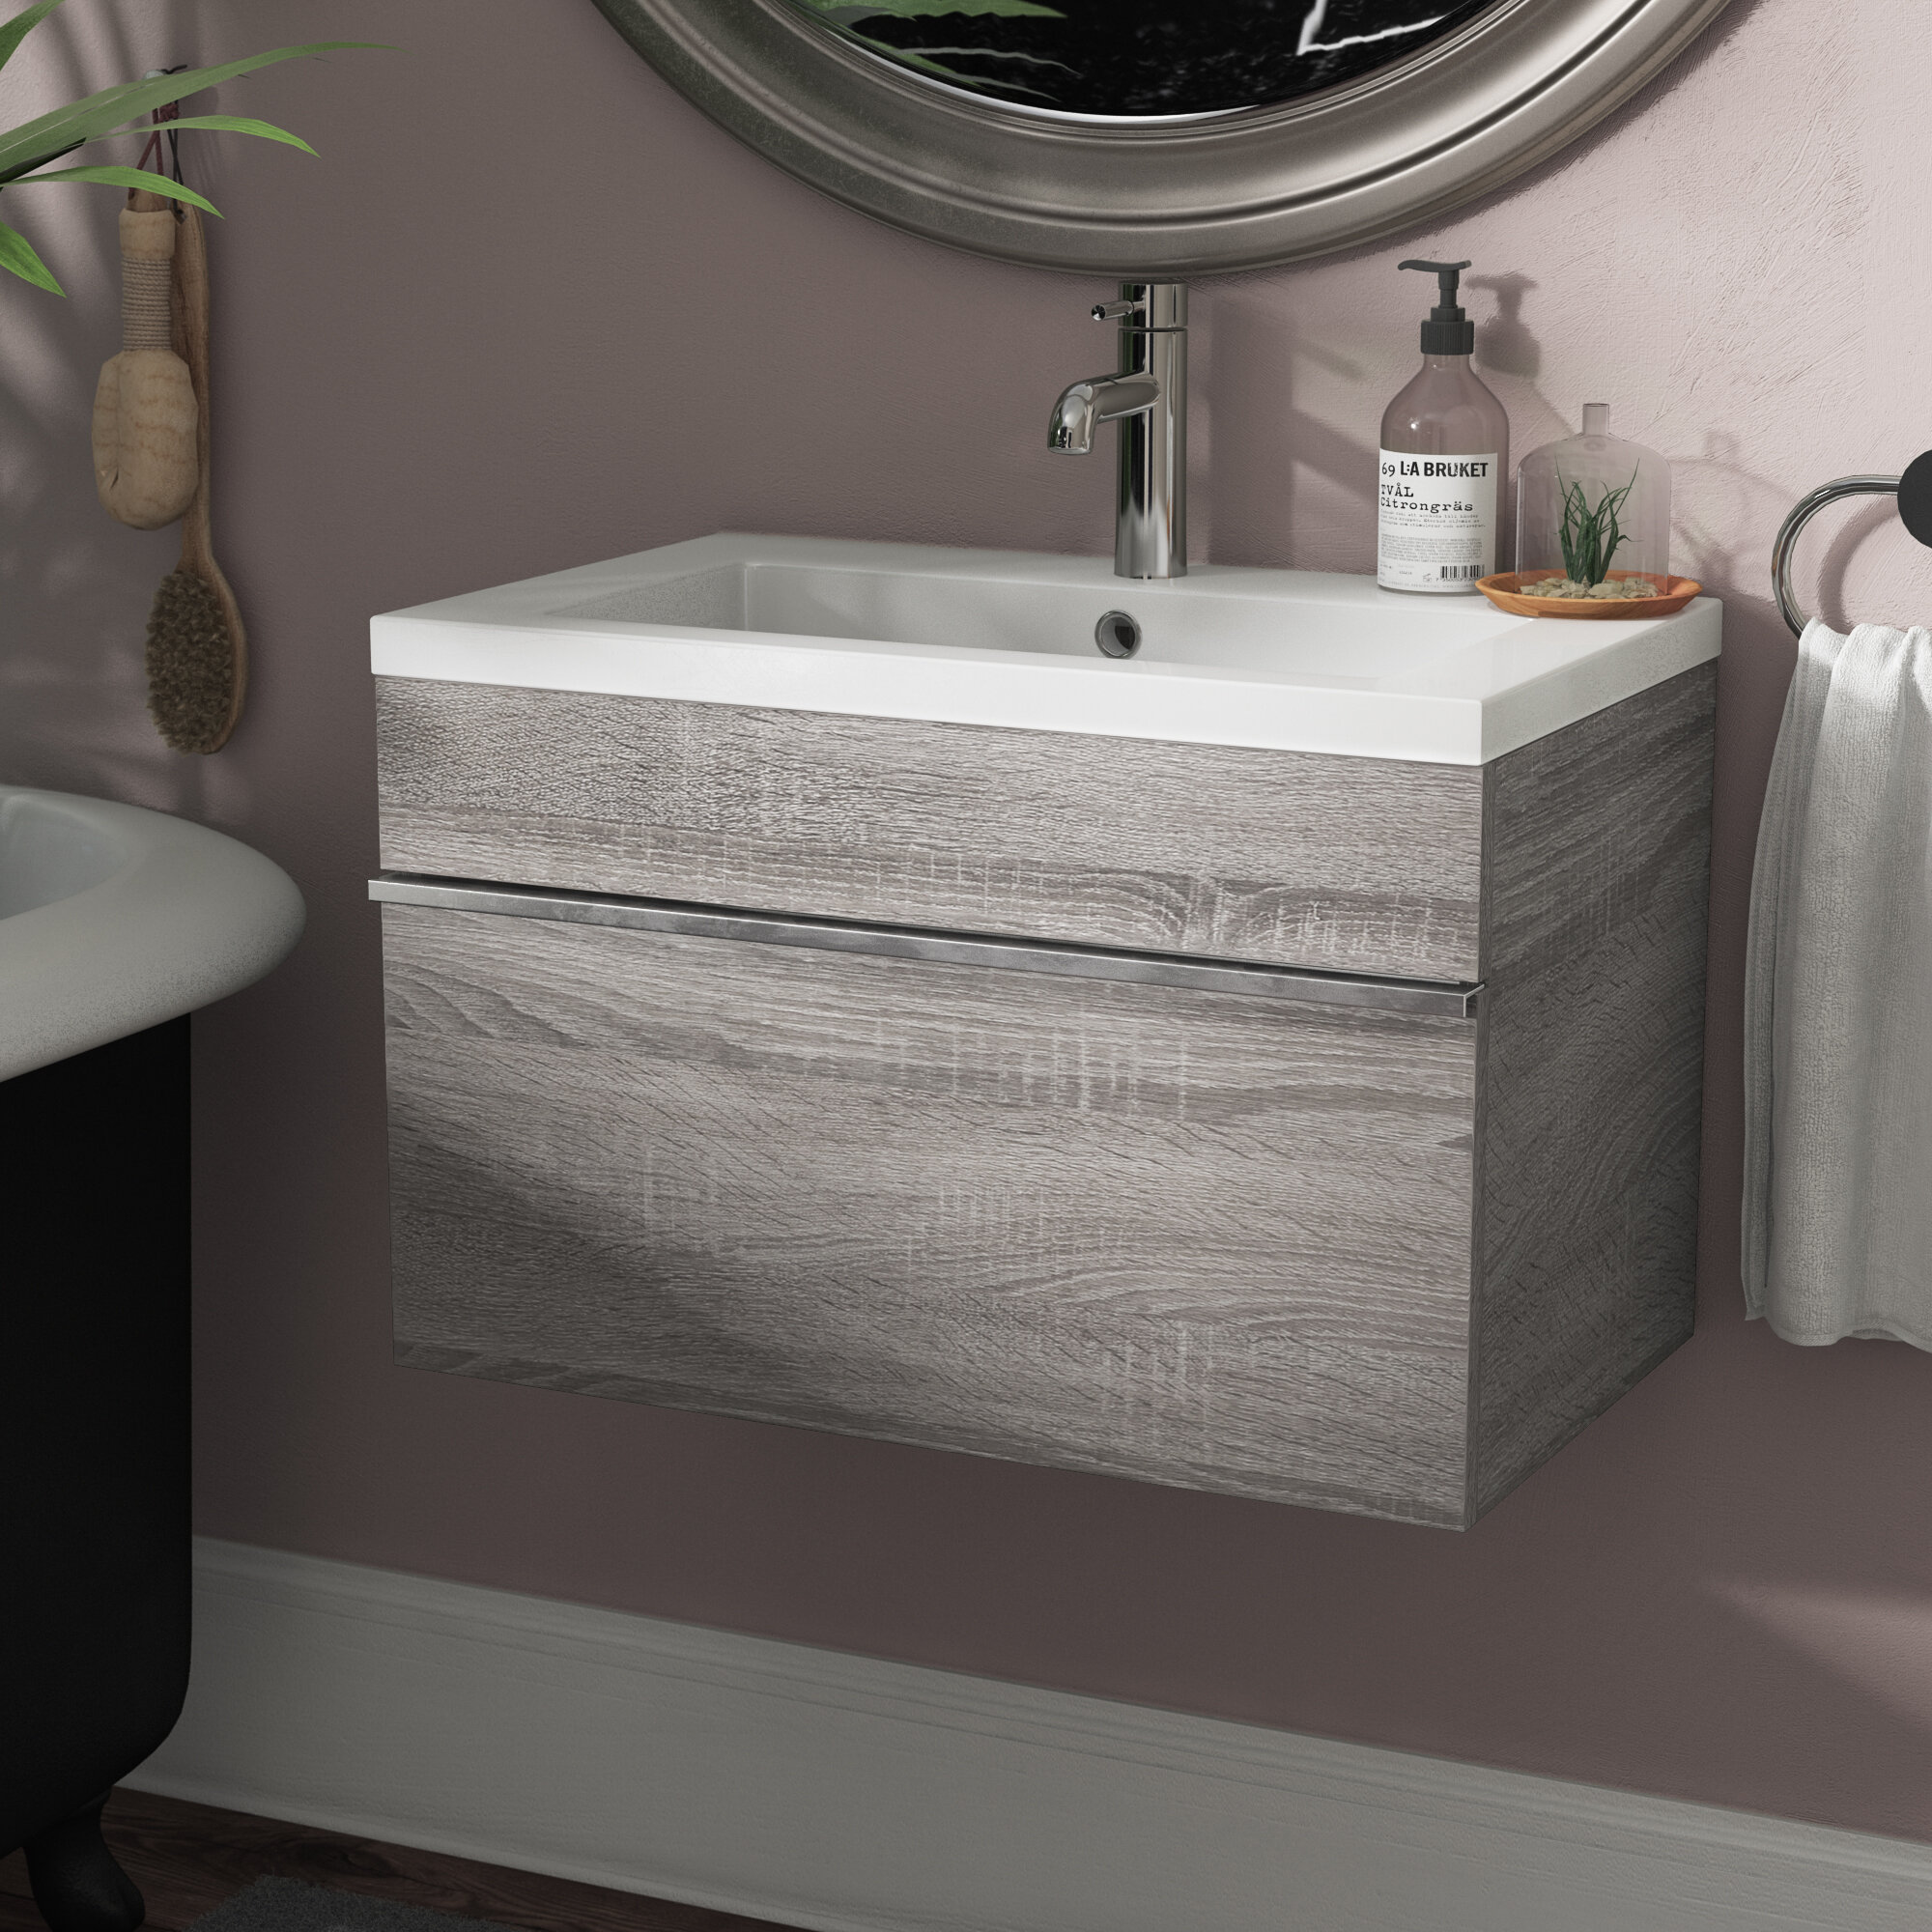 Cutler Kitchen Bath Trough 24 Wall